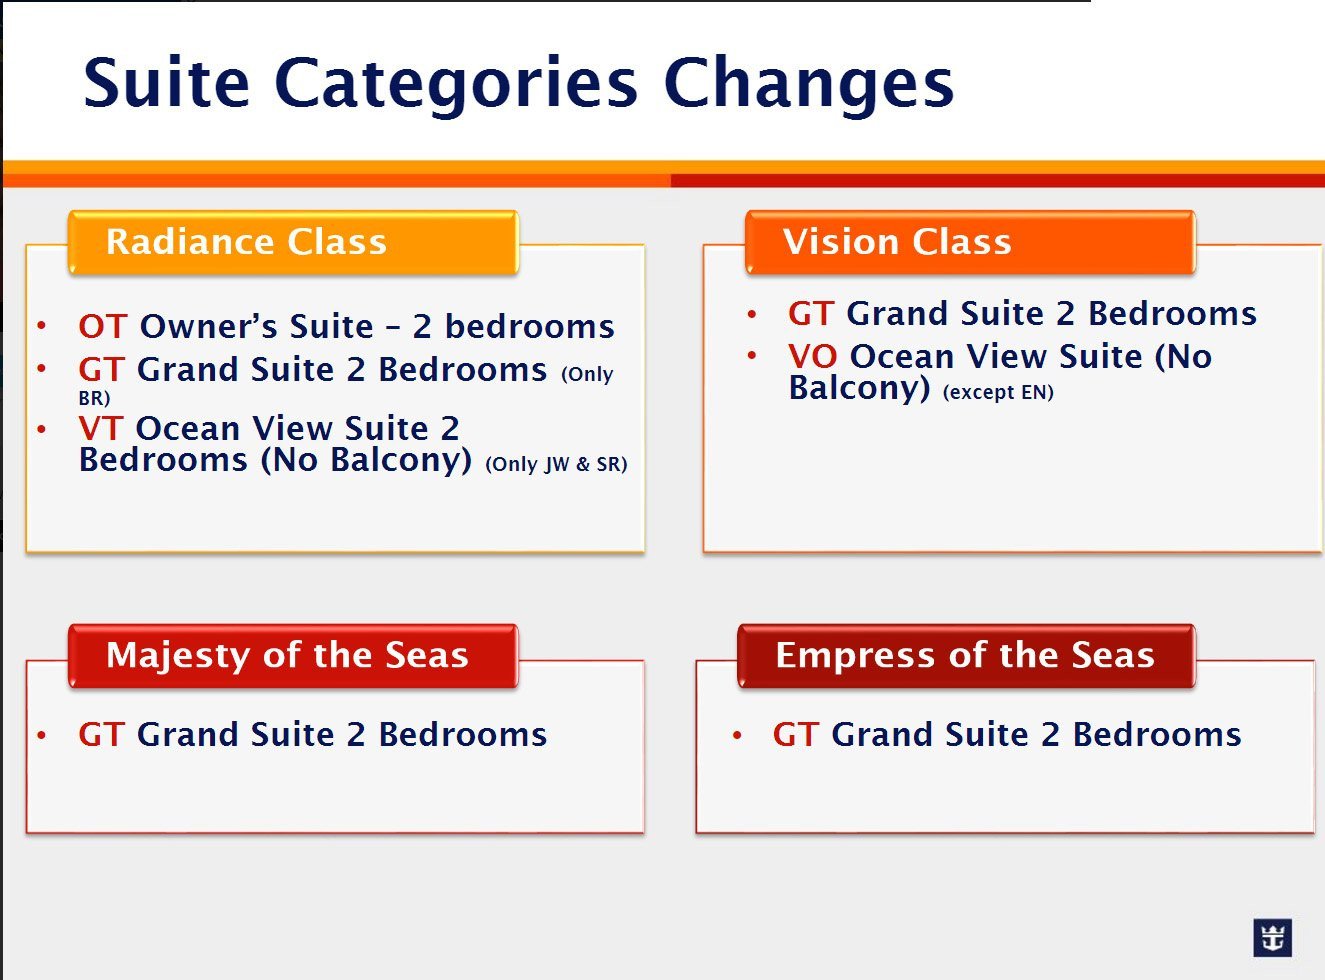 staterooms royal caribbean blog